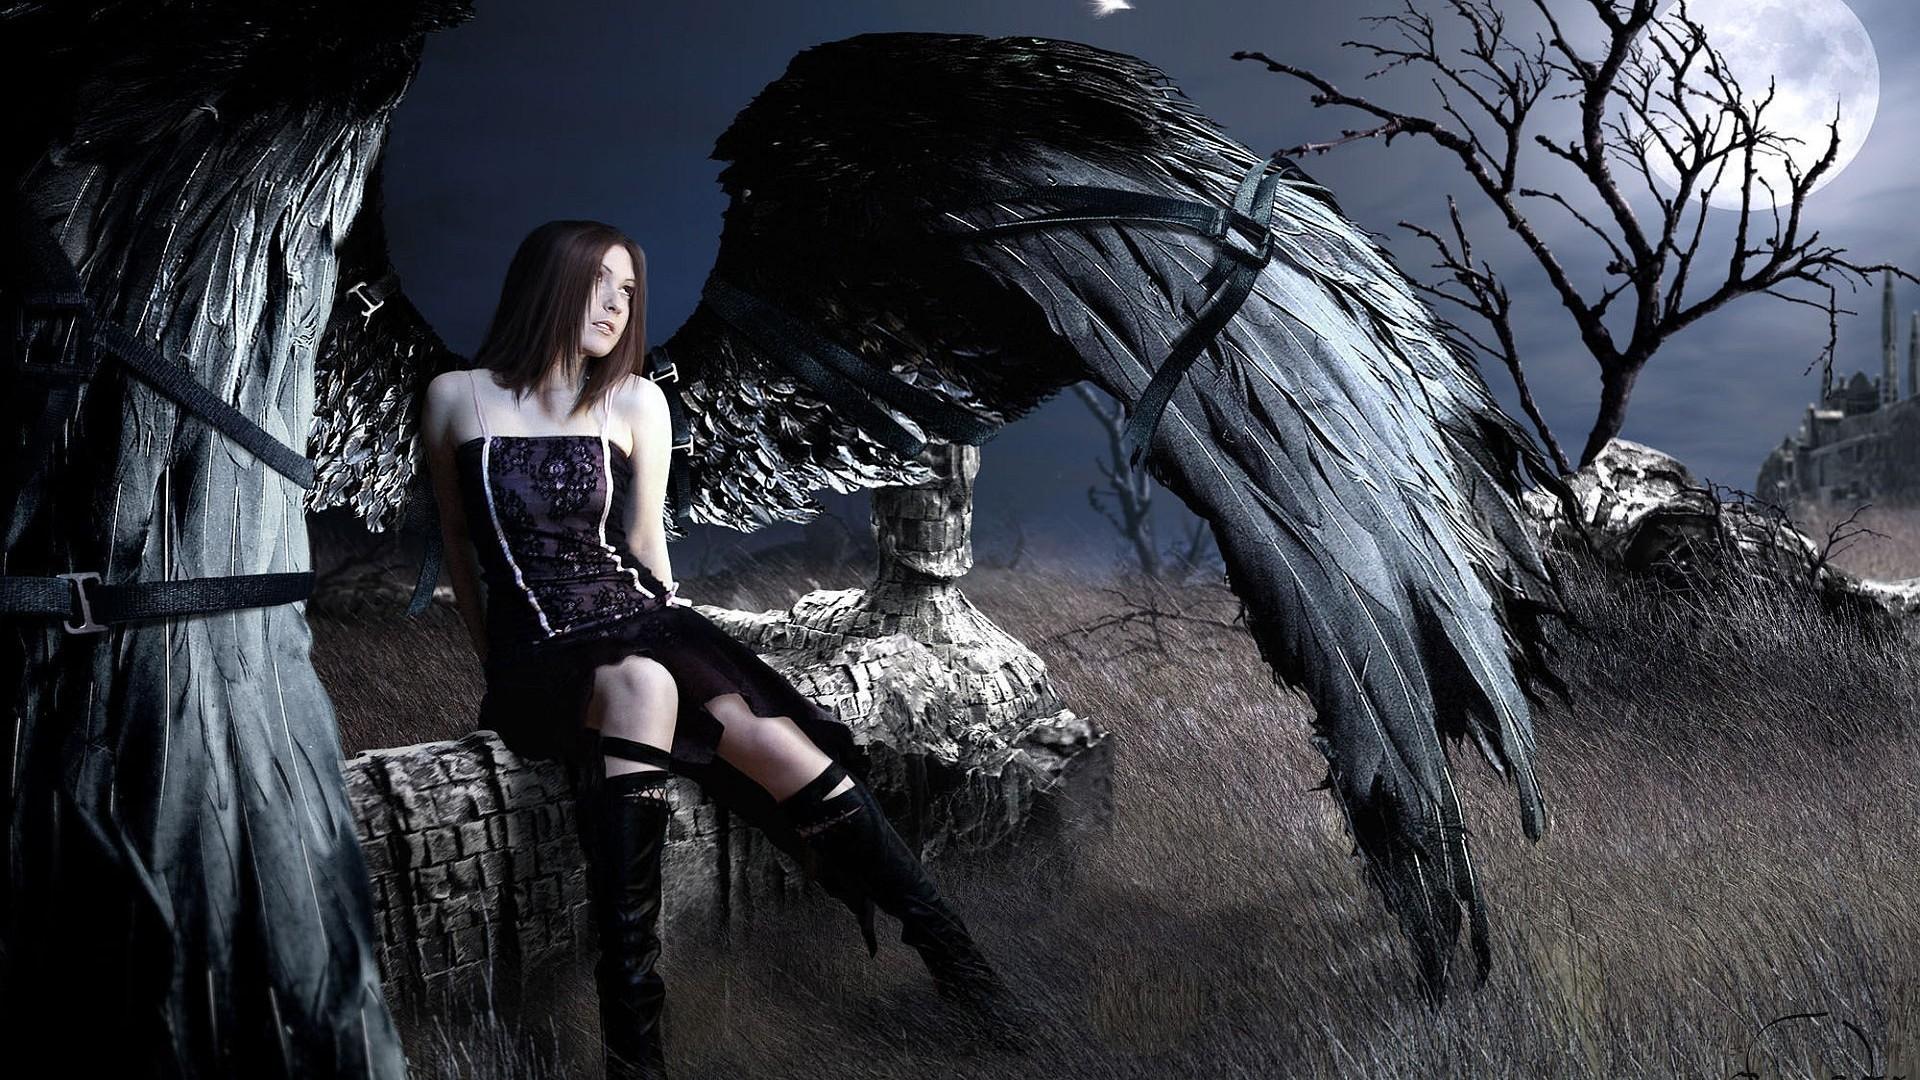 1920x1200 Gothic Girl 896753